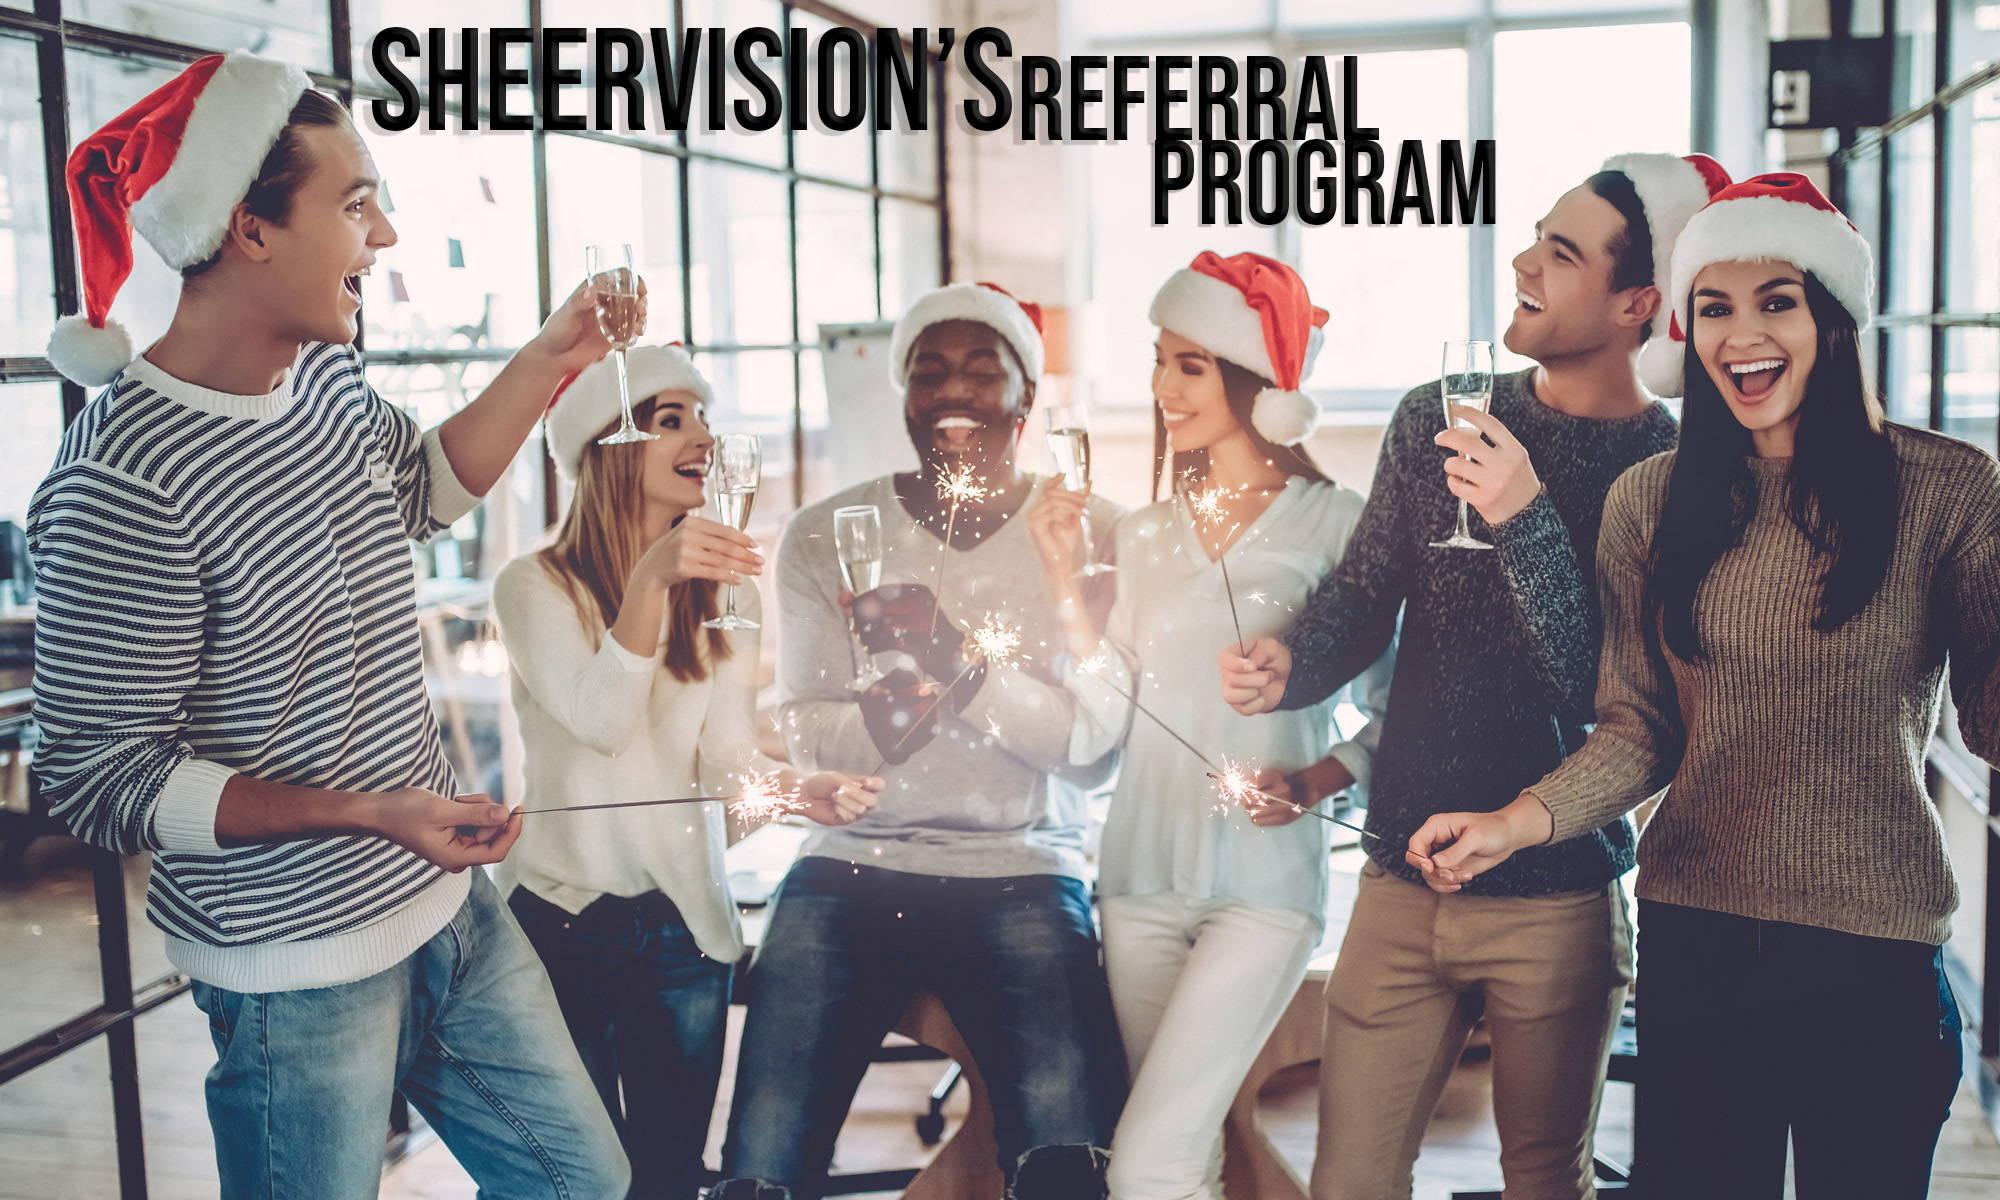 sheervision's referral program